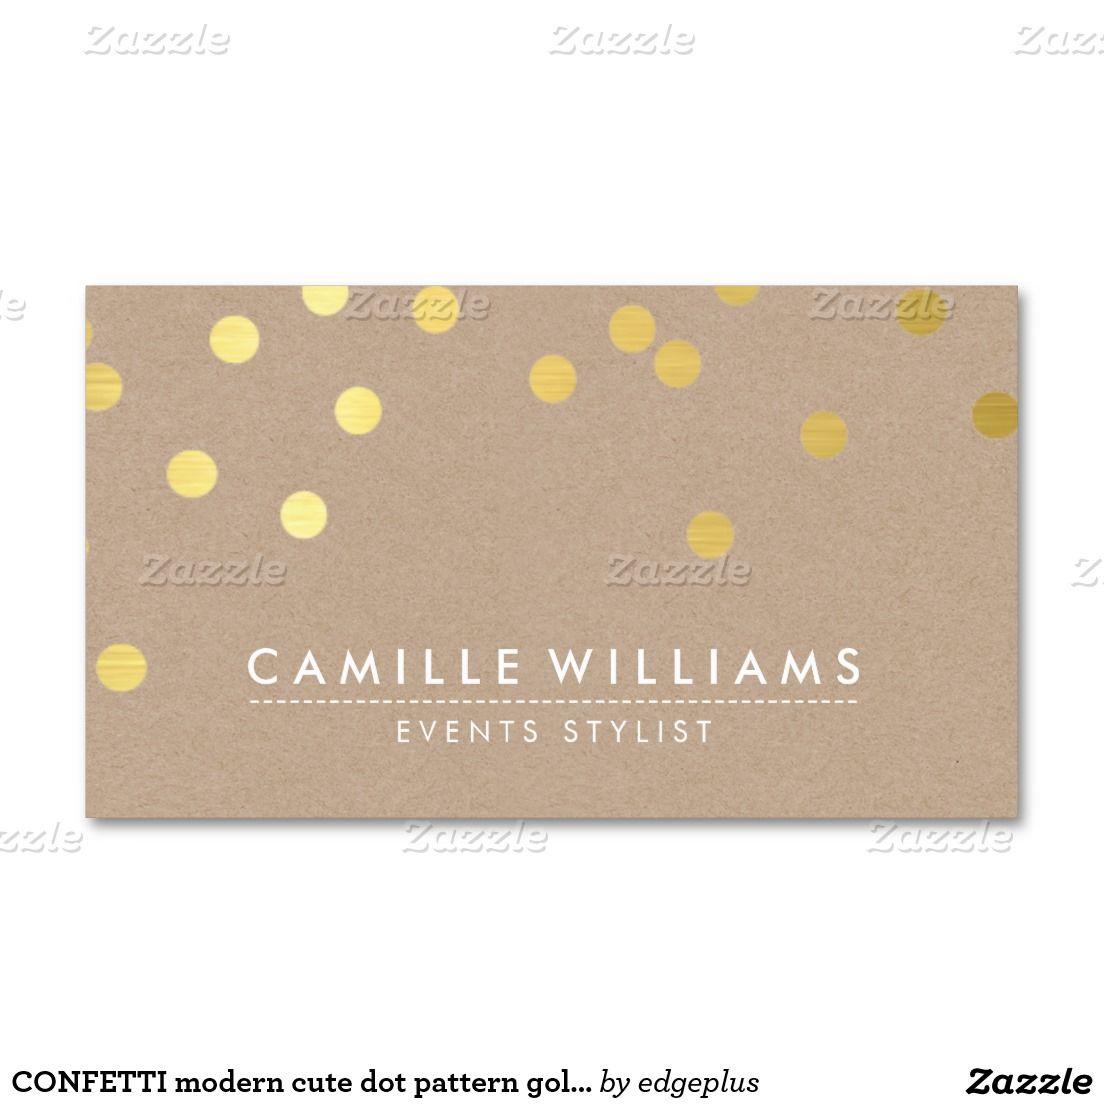 Punktmuster Goldfolie Kraftpapier Des Confetti Visitenkarte